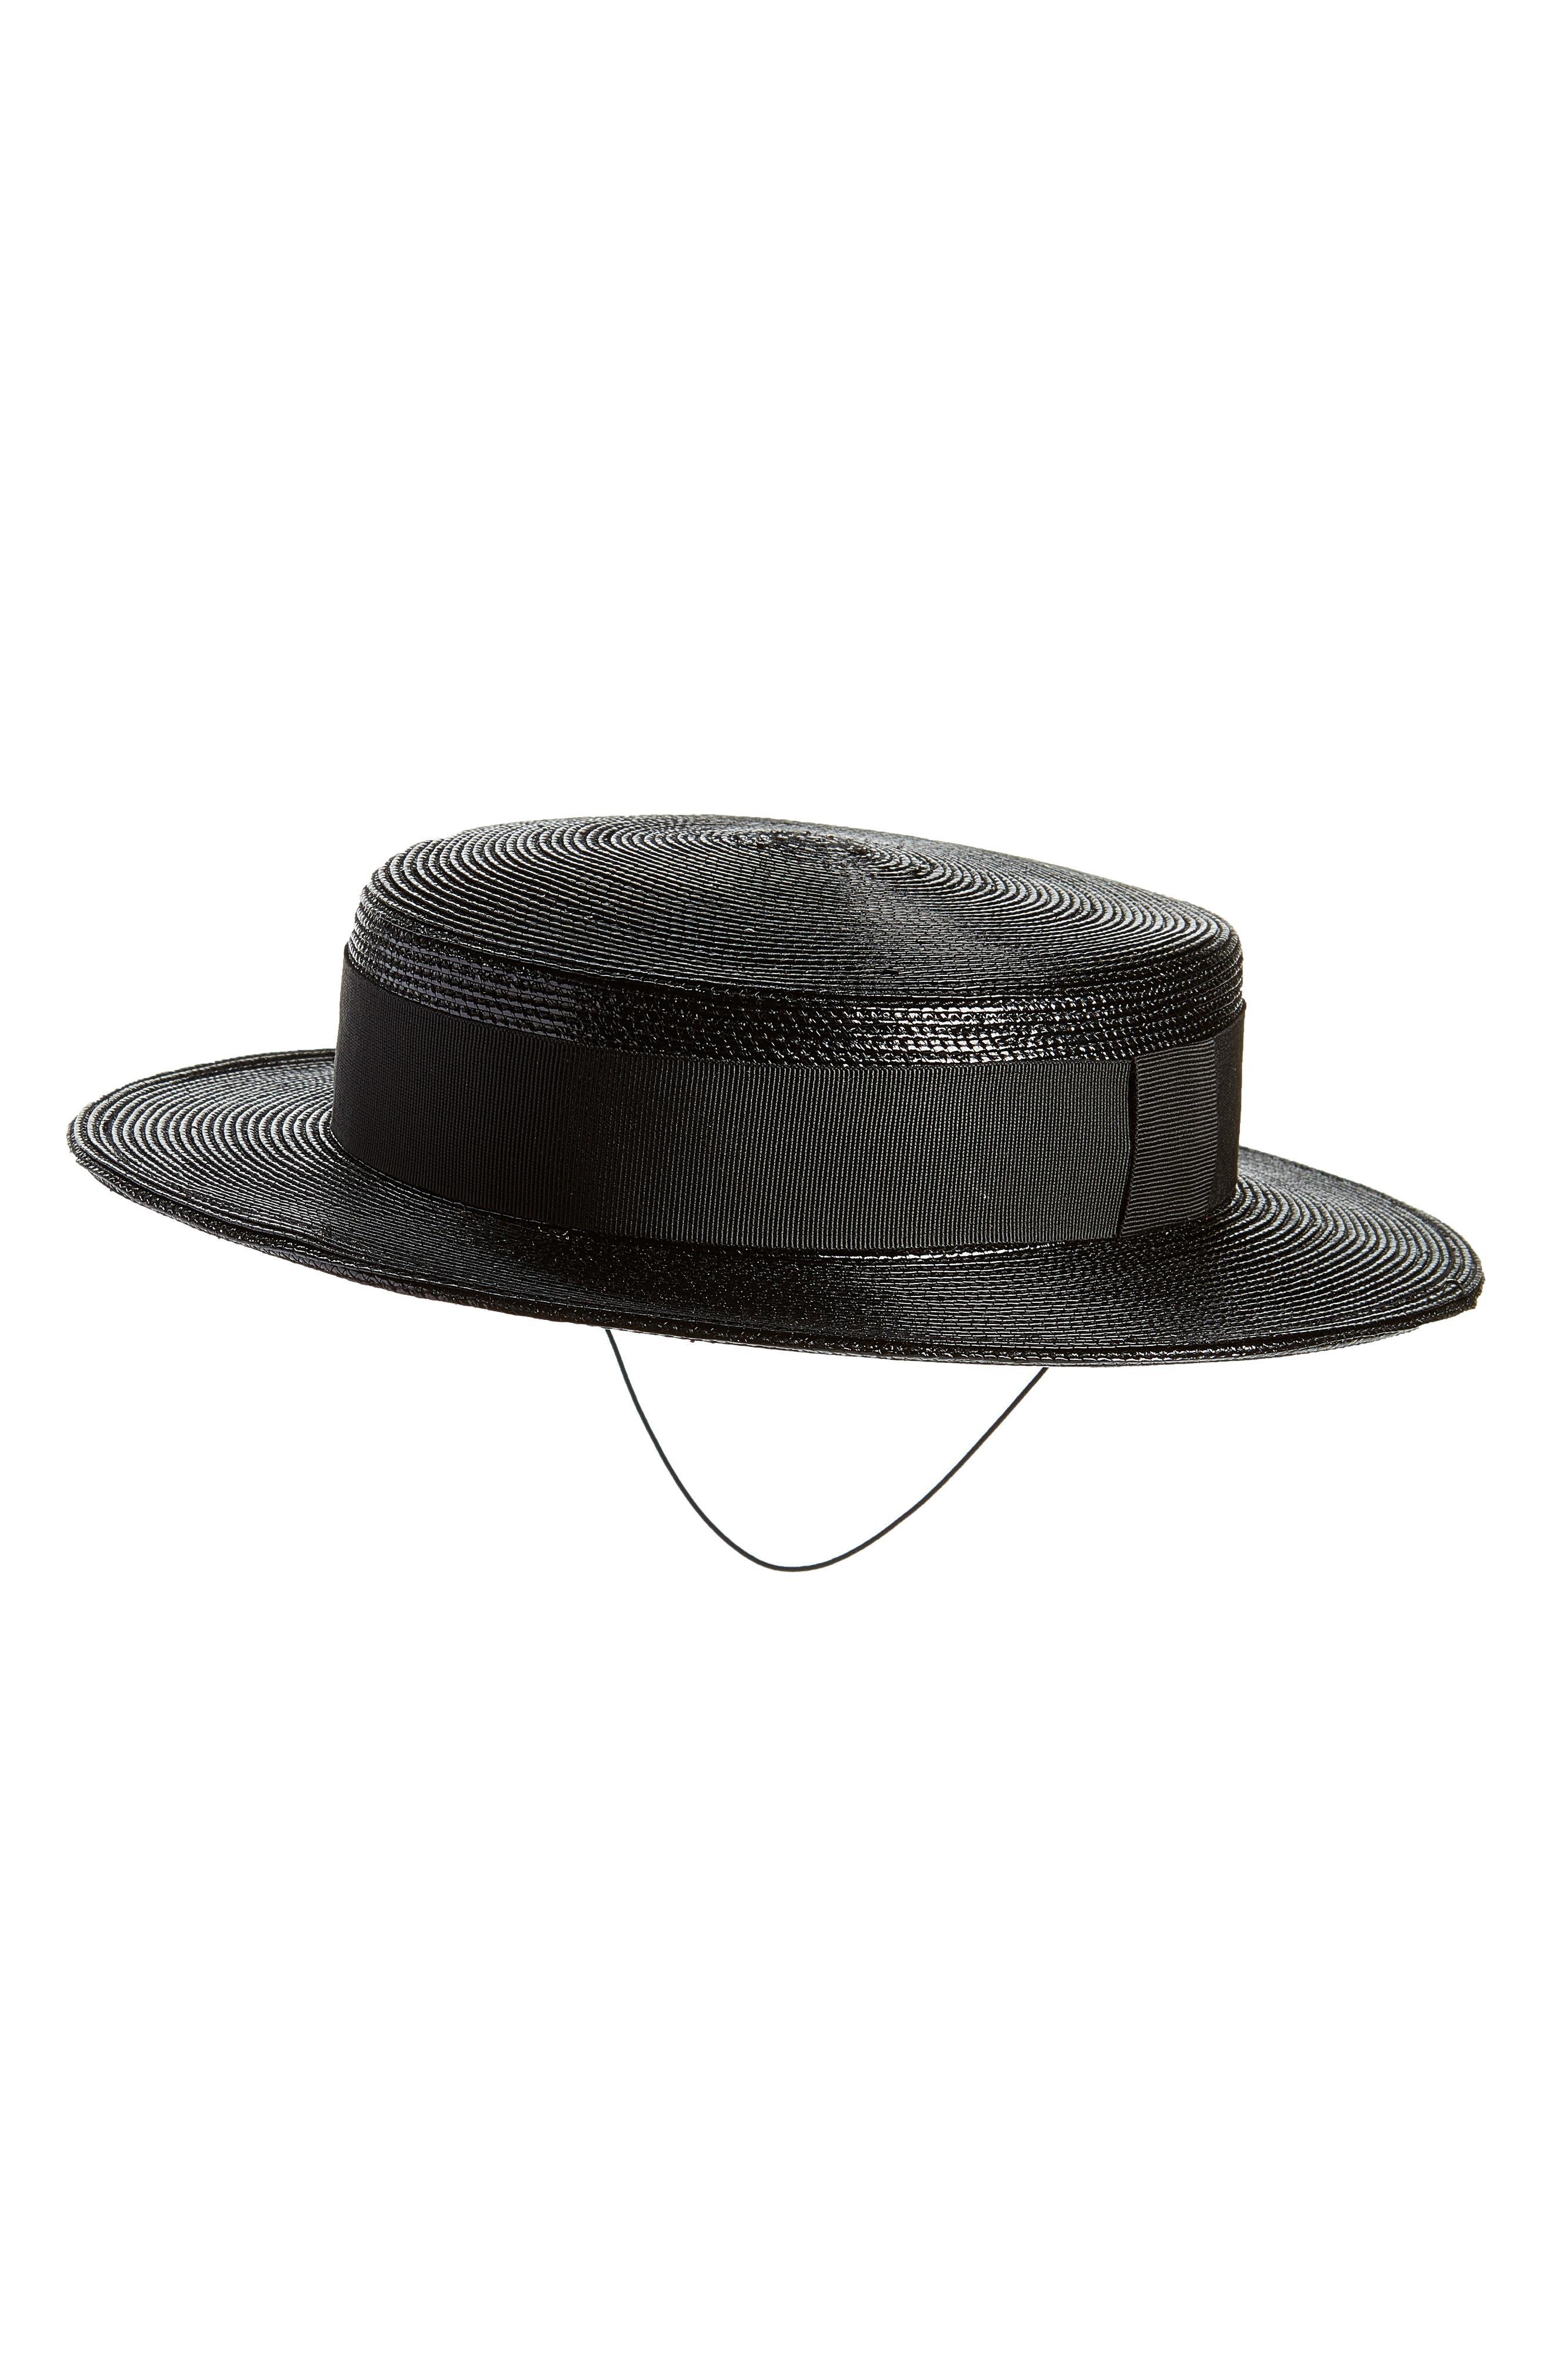 Petite Boater Hat,                             Main thumbnail 1, color,                             BLACK